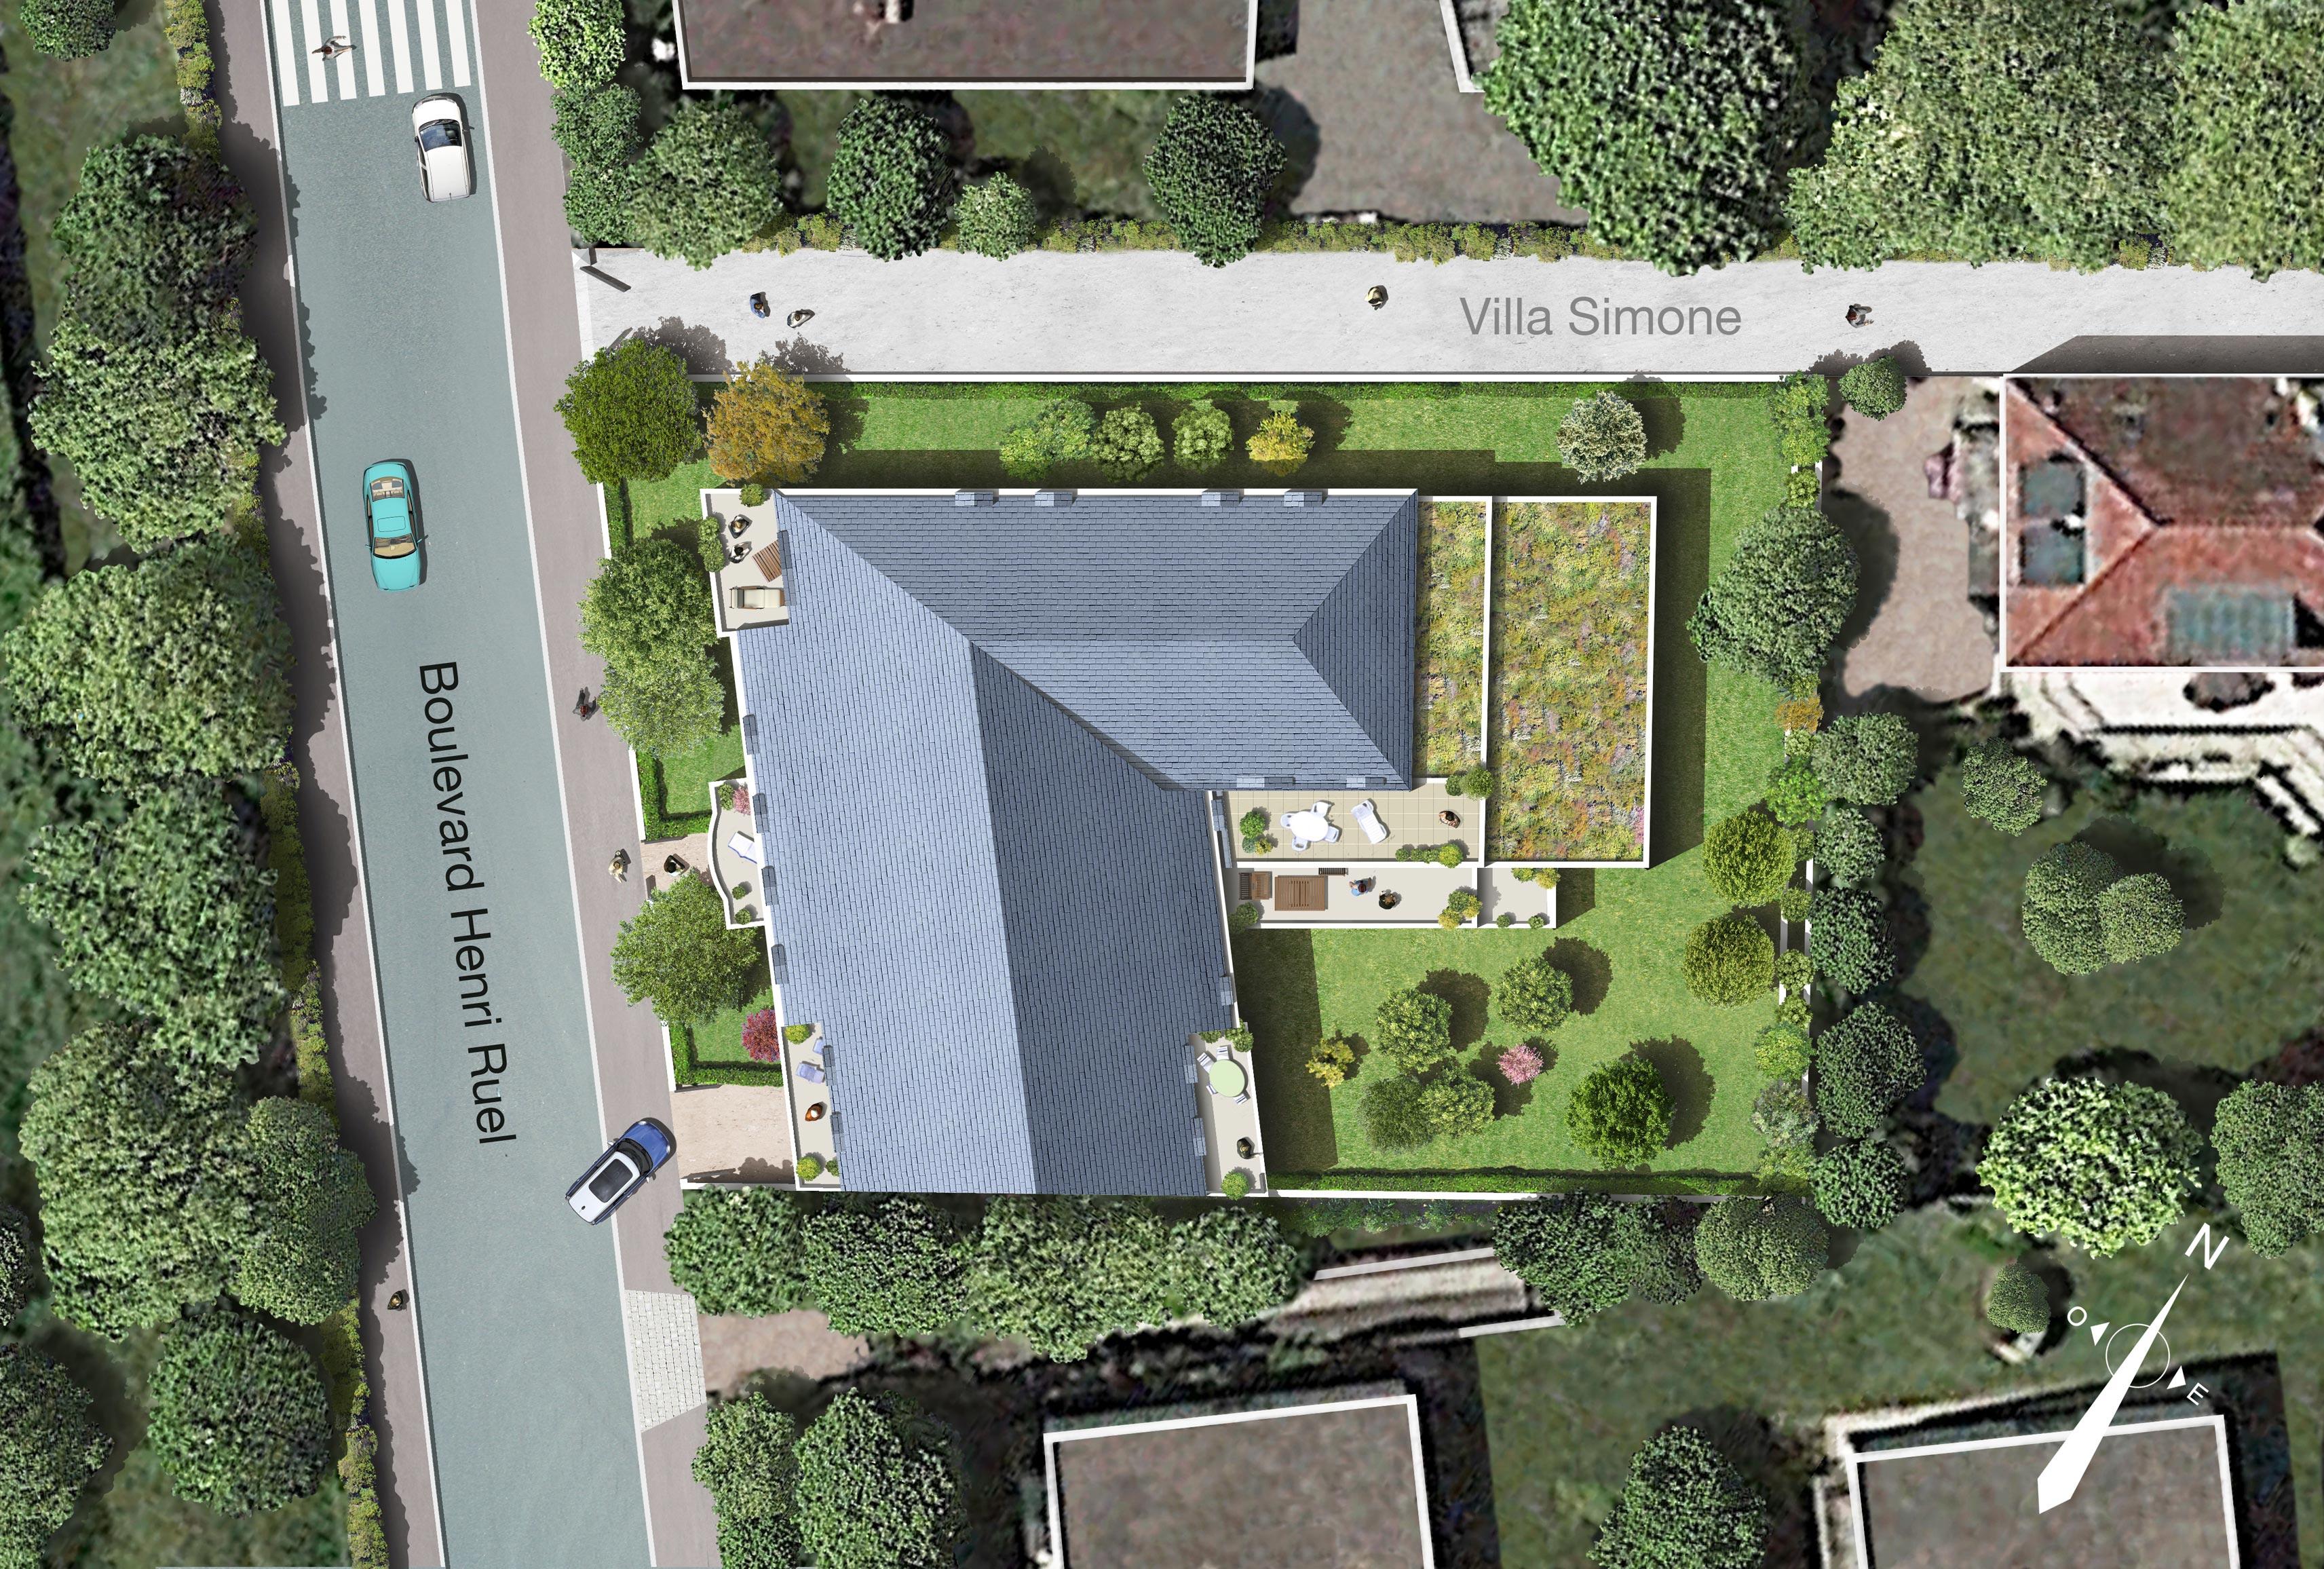 appartements neuf fontenay sous bois 94 villa emeraude beryl investissement immobilier. Black Bedroom Furniture Sets. Home Design Ideas